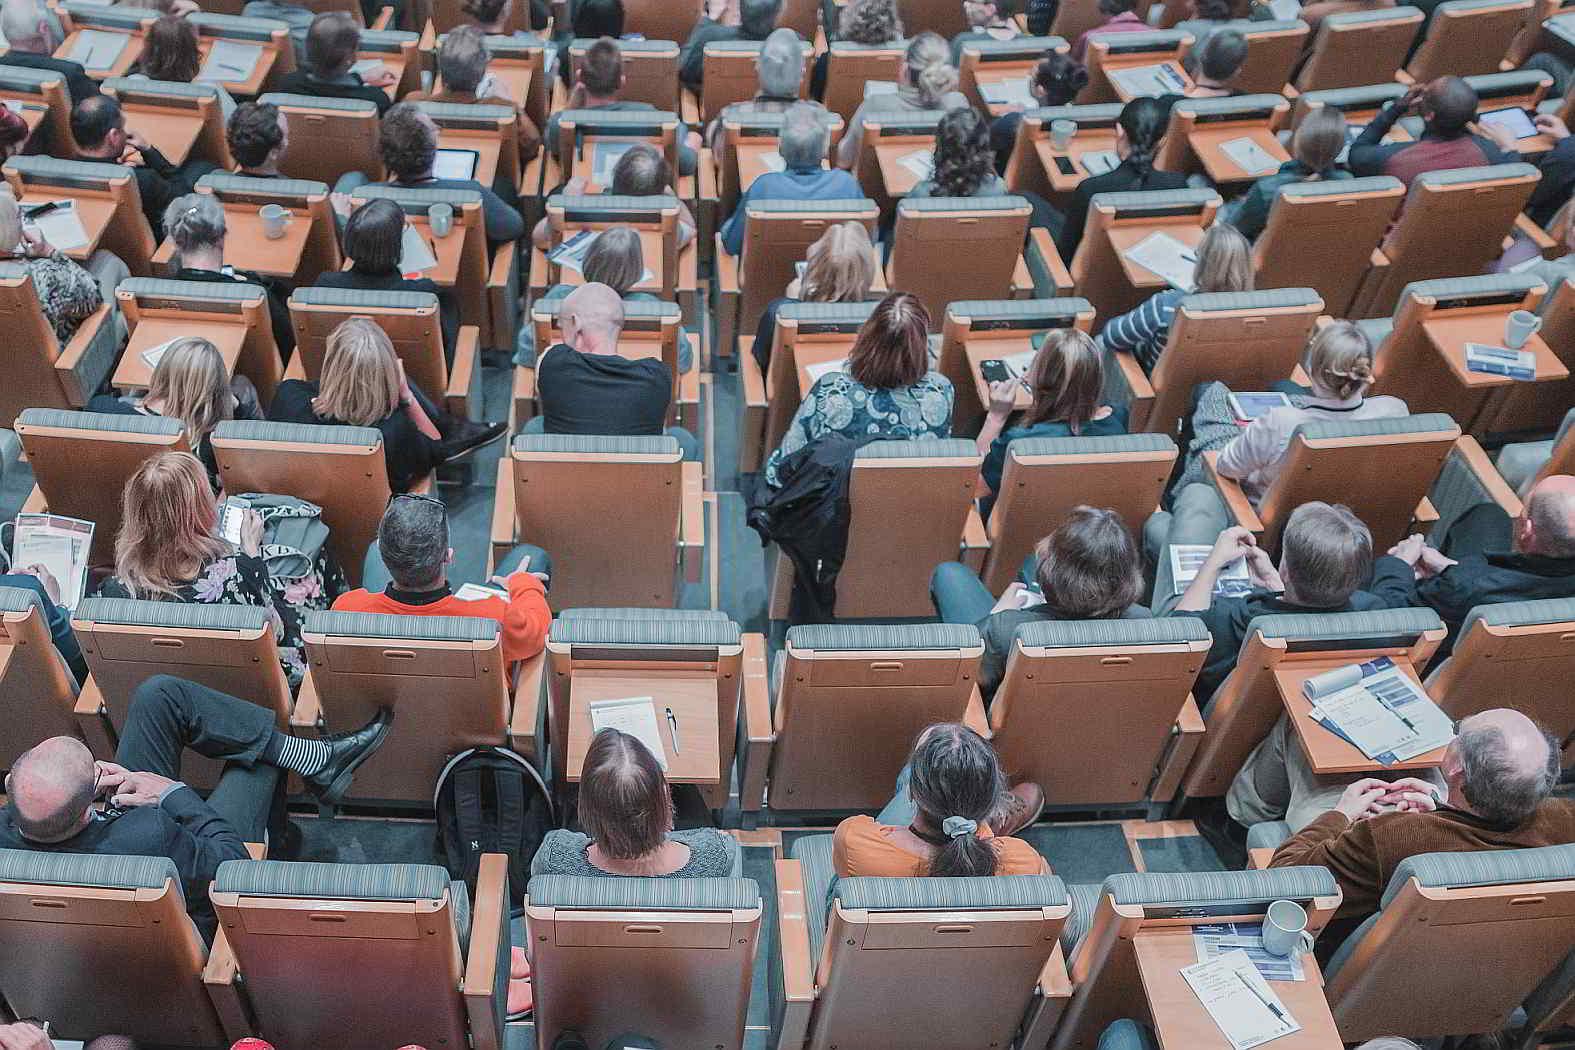 Cátedra universitaria Auditorio Clases